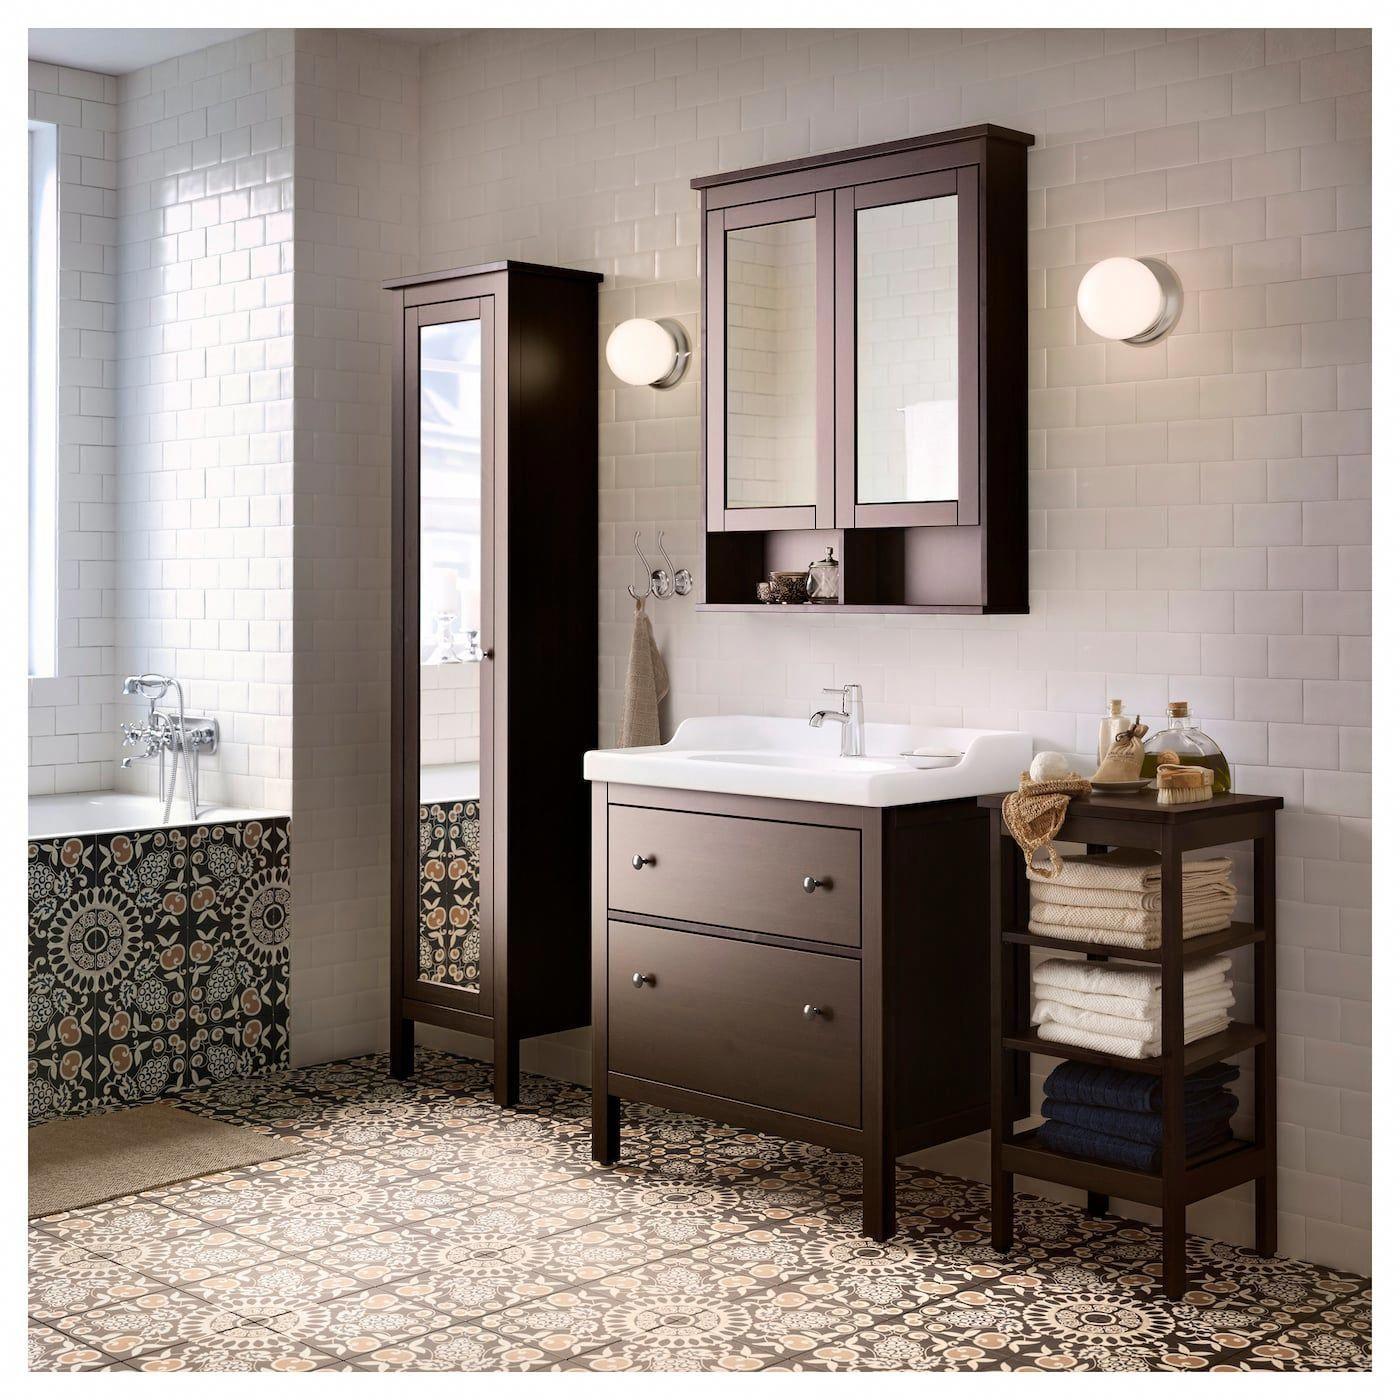 Hemnes High Cabinet With Mirror Door Black Brown Stain 19 1 4x12